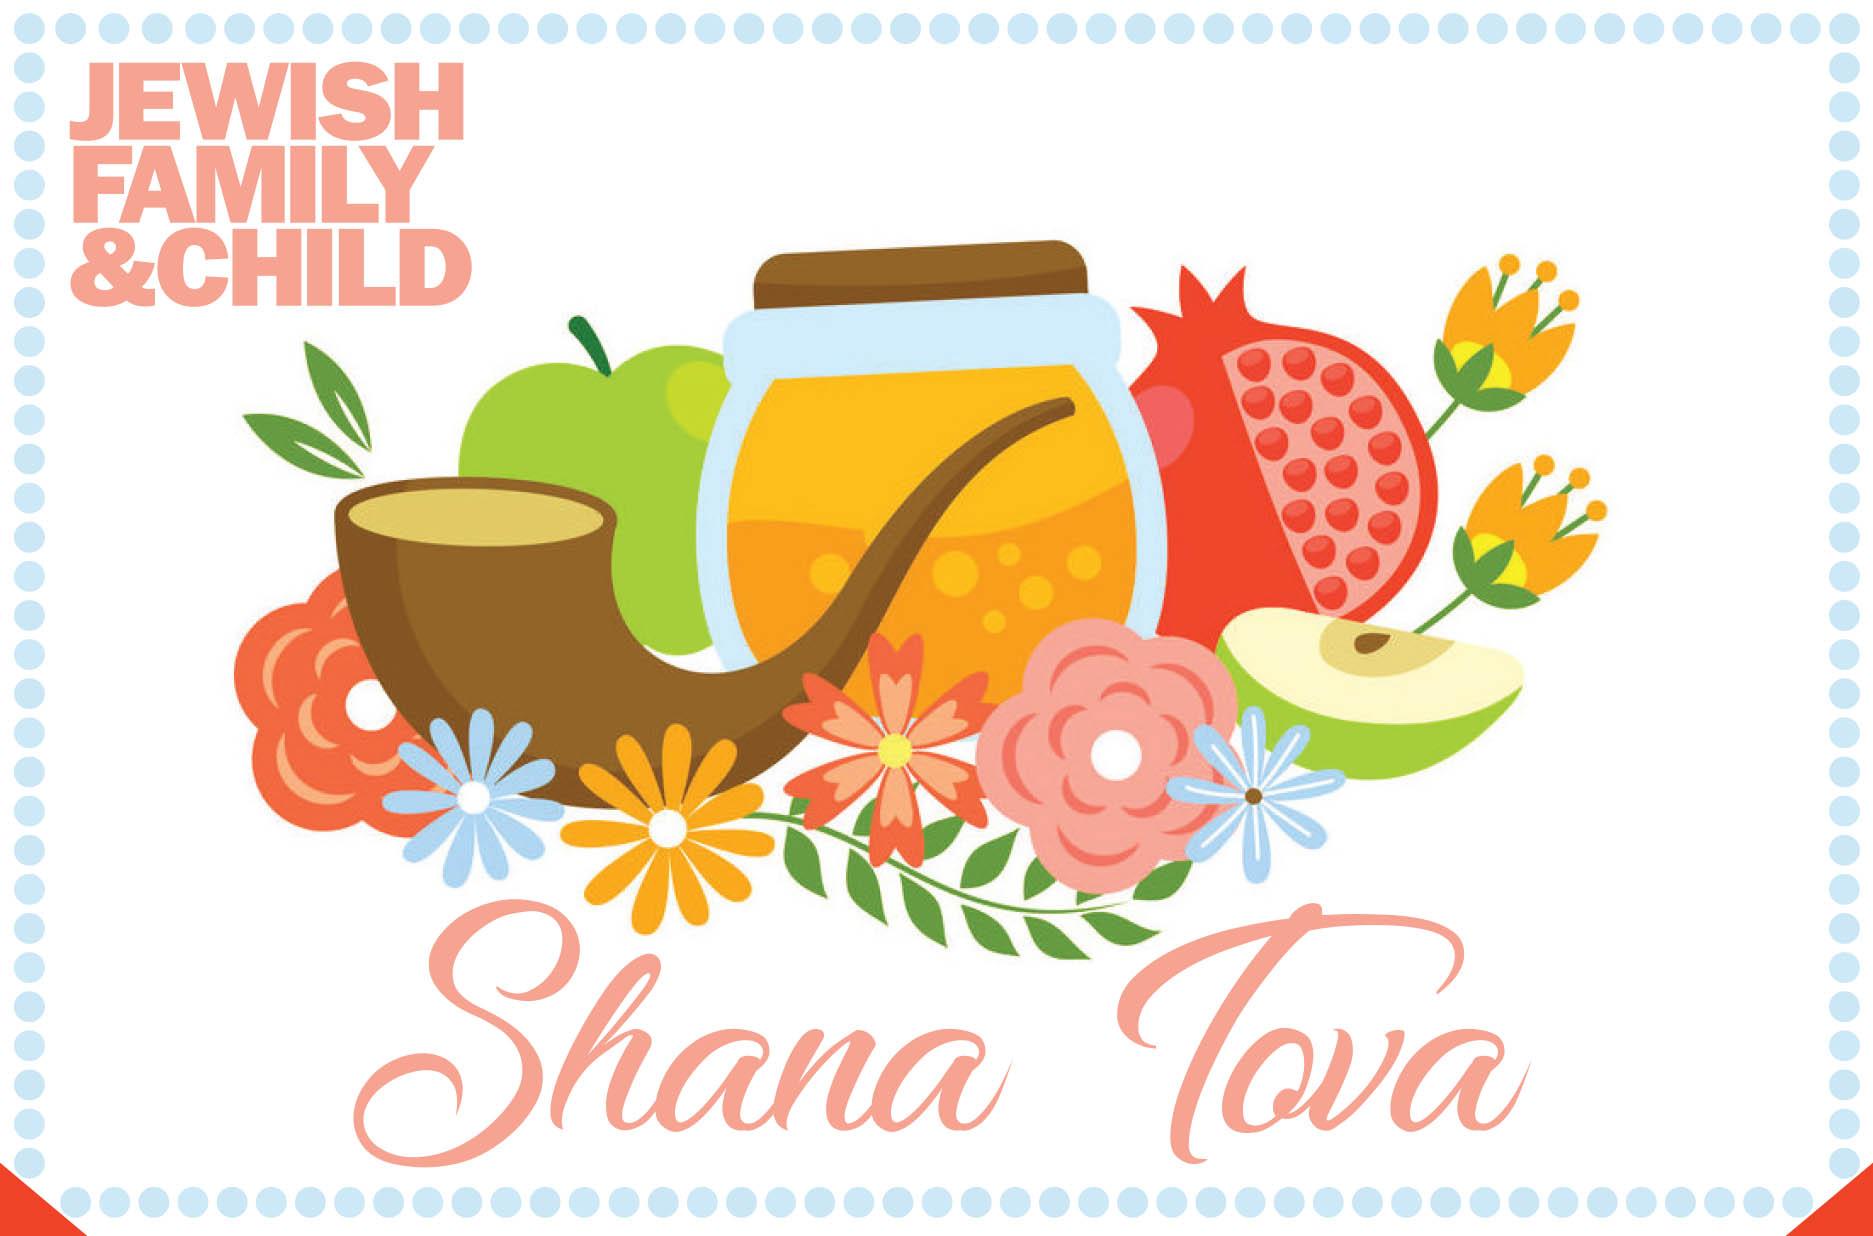 Hebrew rosh hashanah greeting cards m4hsunfo